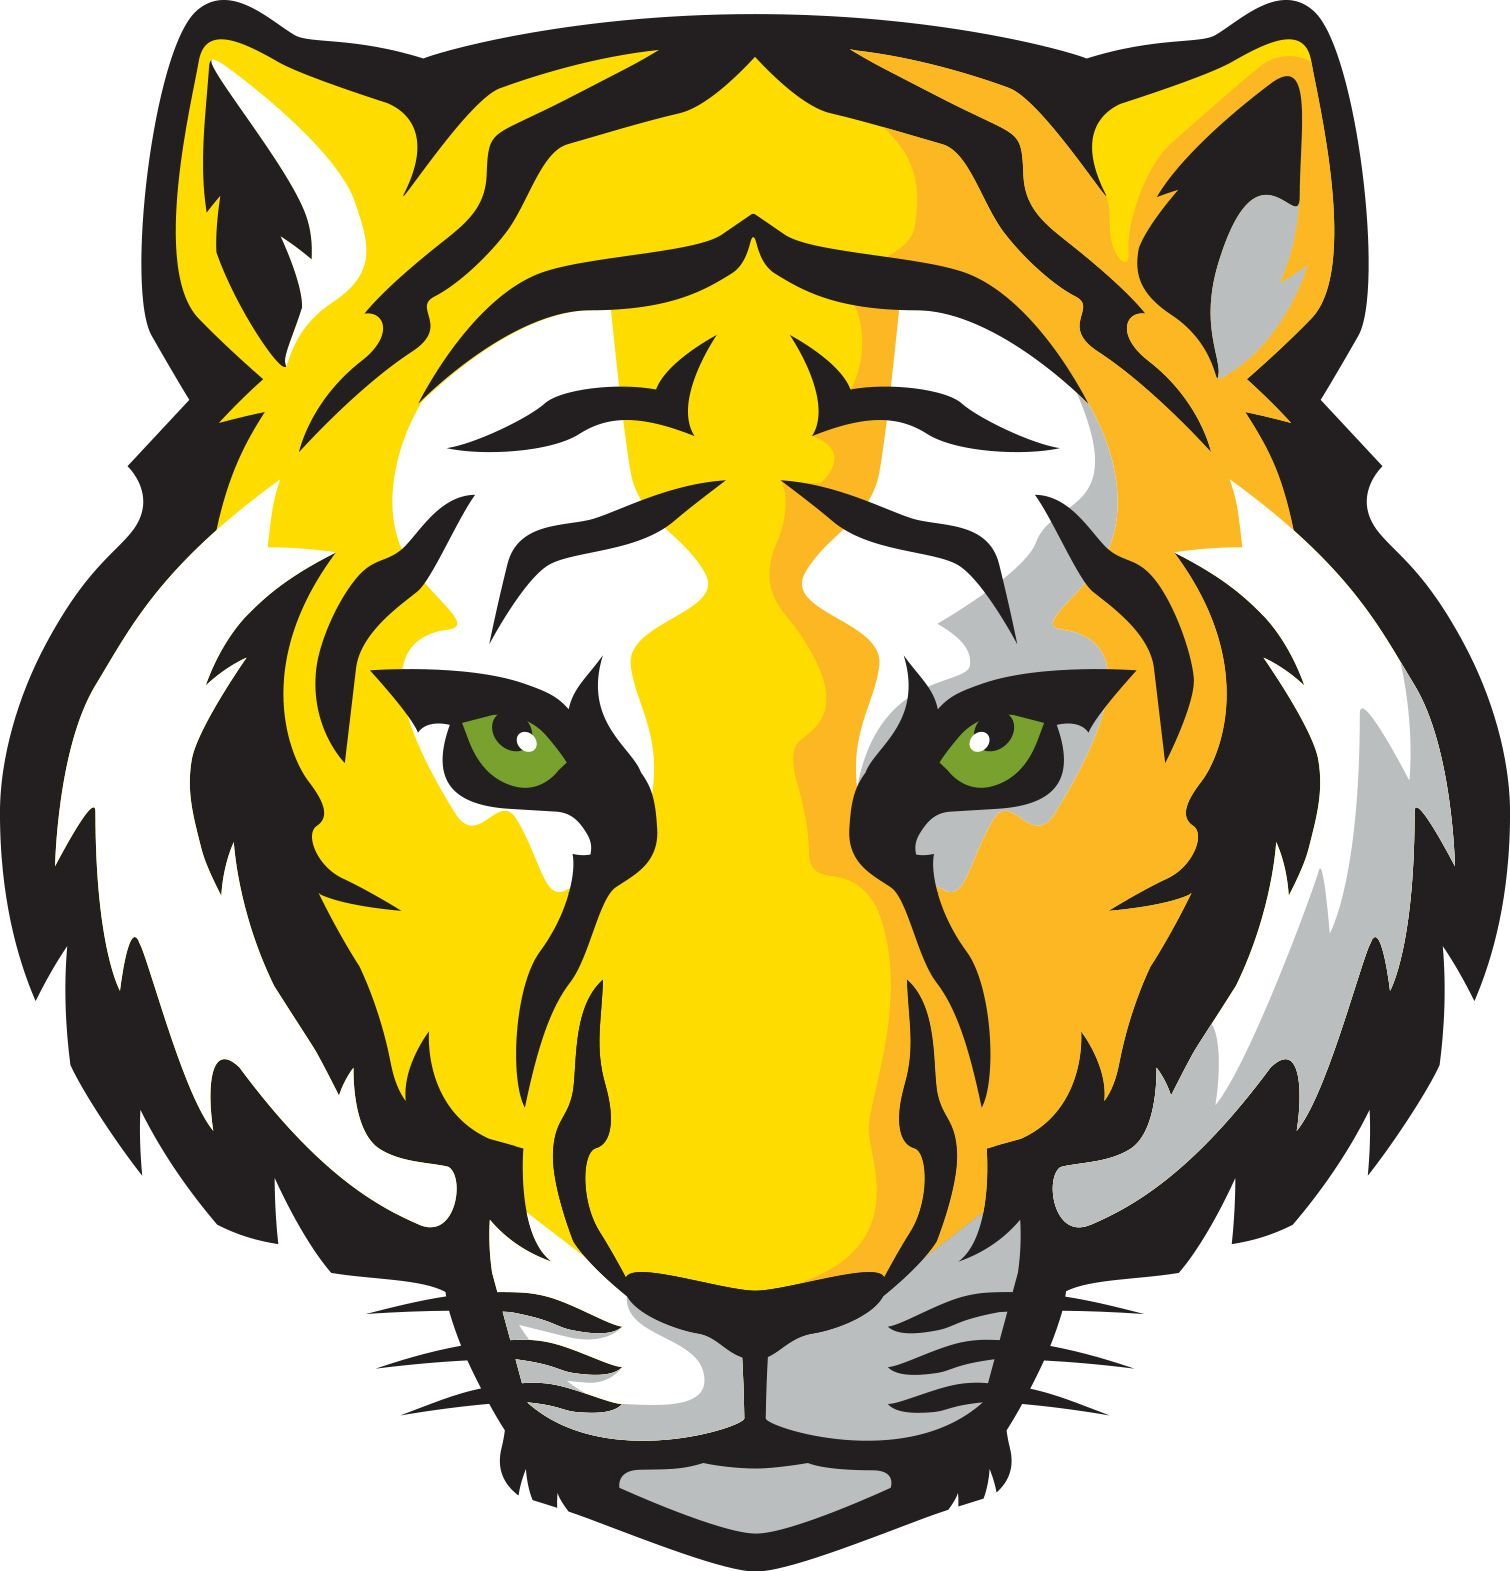 Depauw Tiger C Jpg 1510 1571 Arte De Rua Desenho De Ninja Desenho